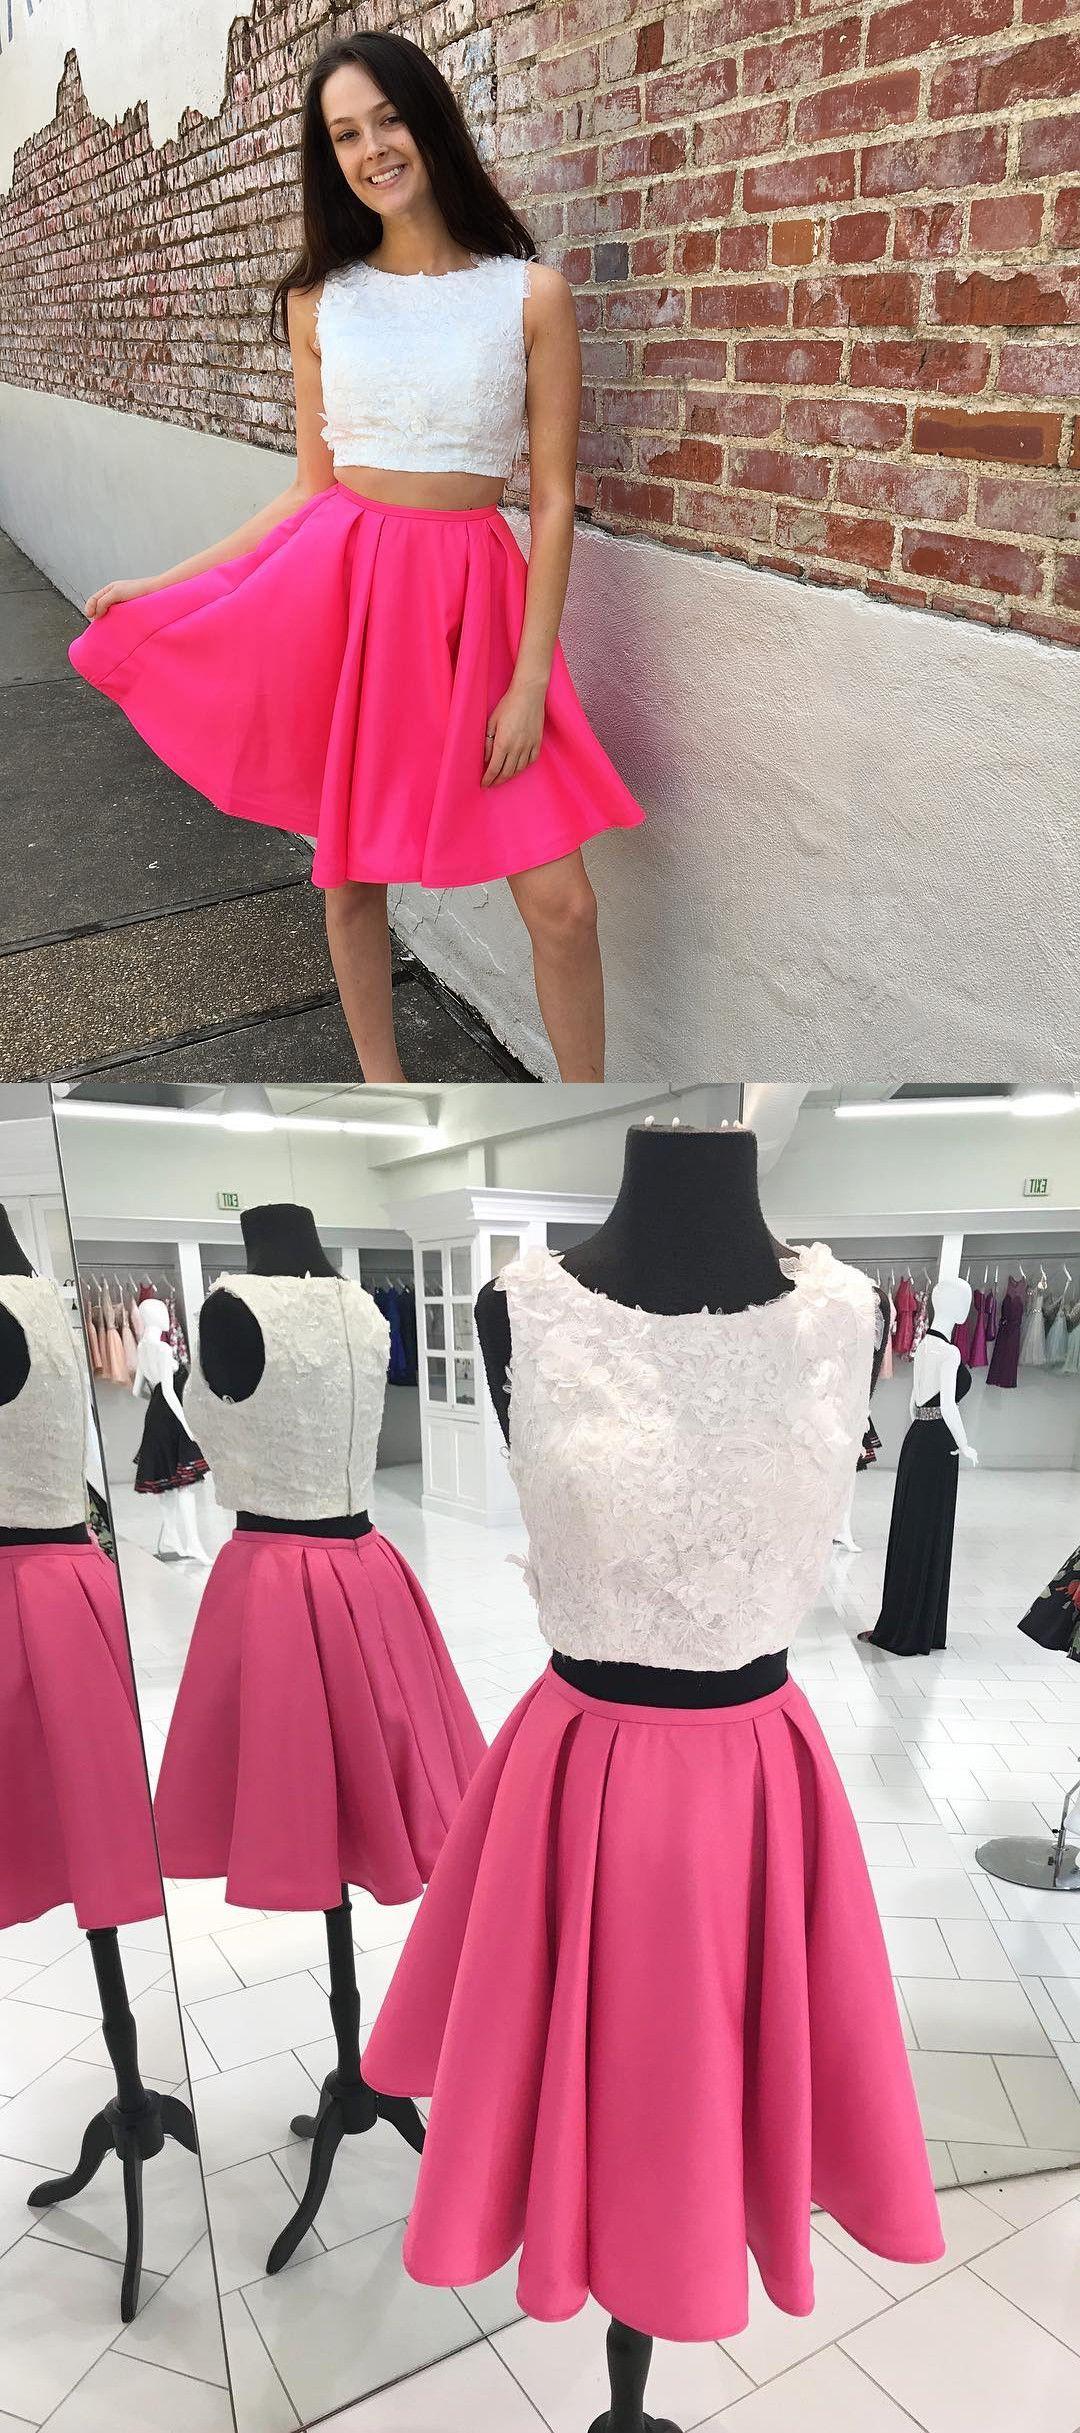 c96ae6e6cf99 2018 two piece short prom dress homecoming dress, 2 piece white and hot  pink homecoming dress